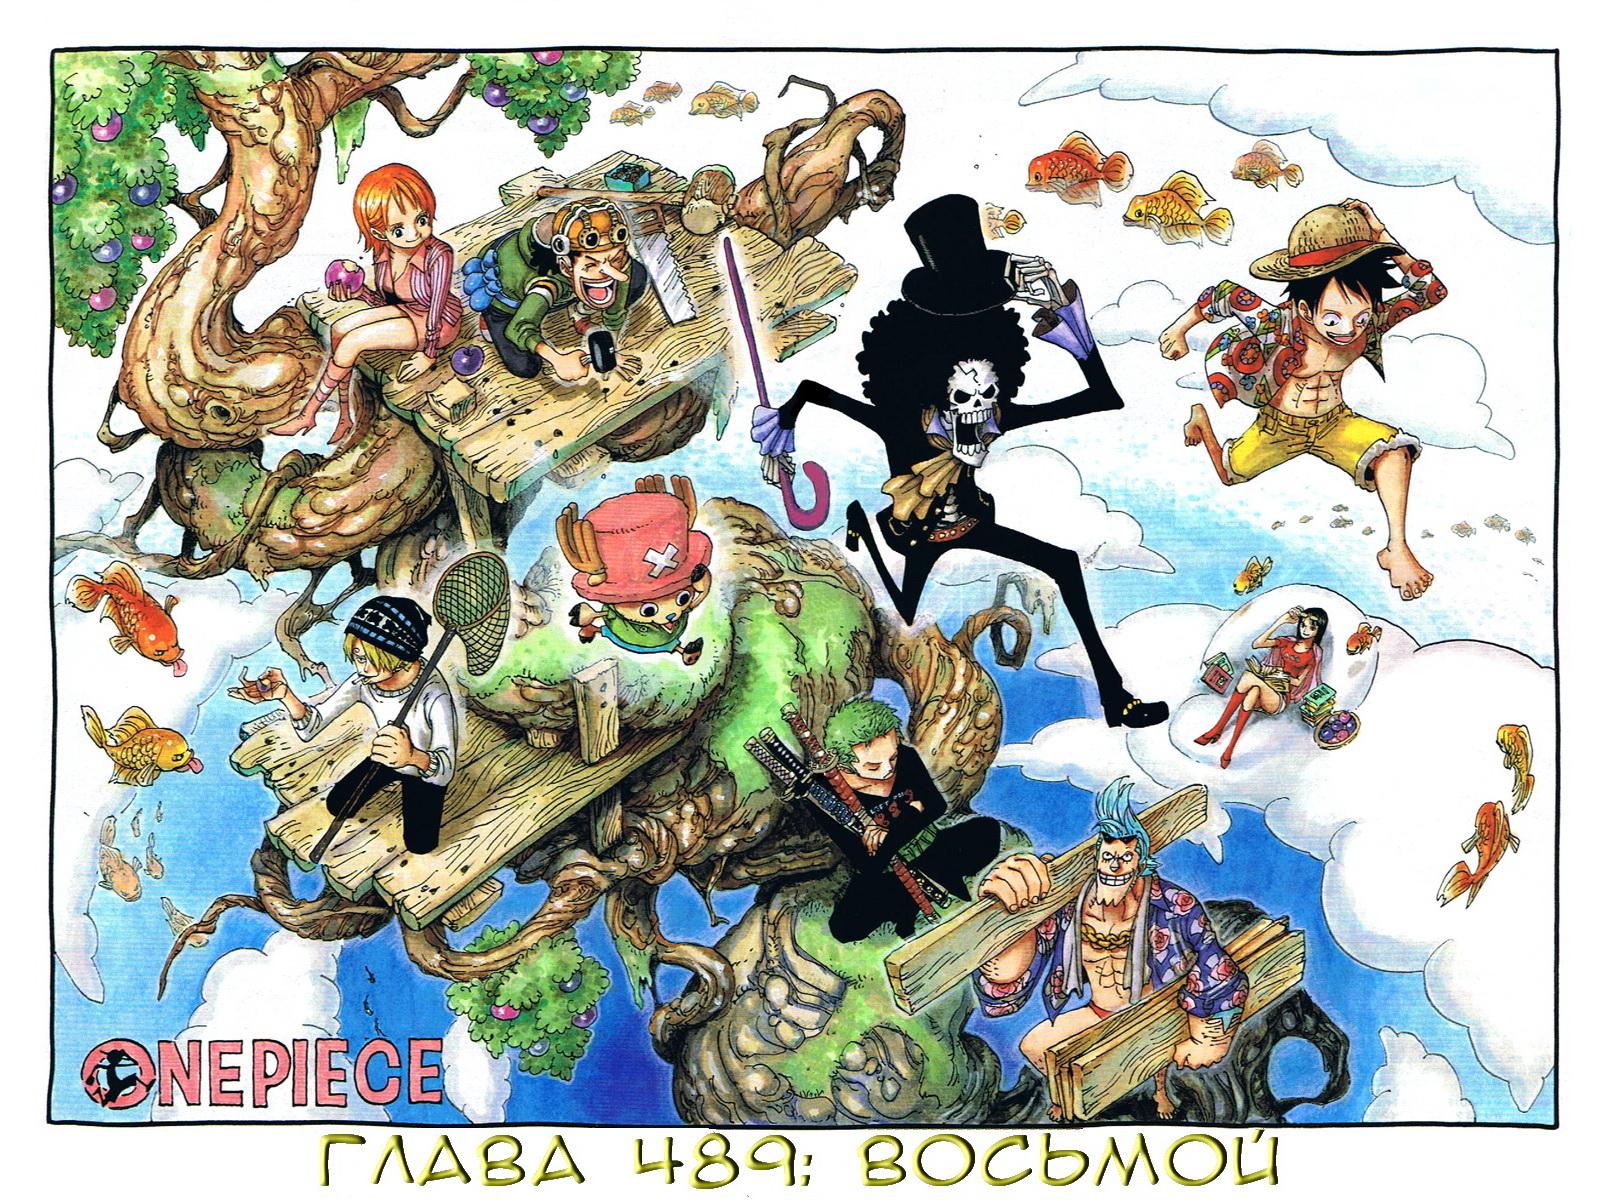 Манга One Piece / Ван Пис Манга One Piece Глава # 489 - Восьмой, страница 1